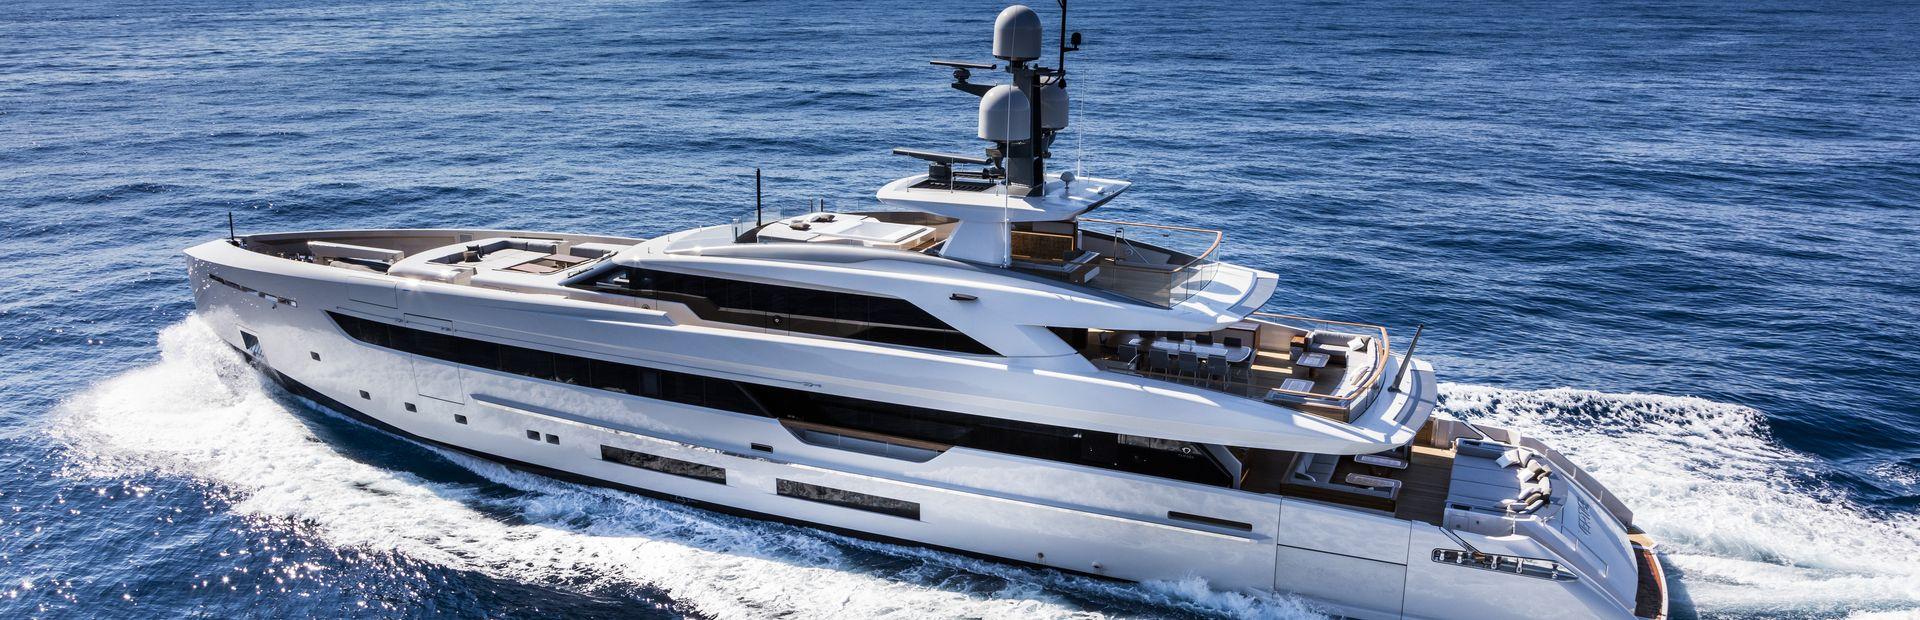 S501 Yacht Charter